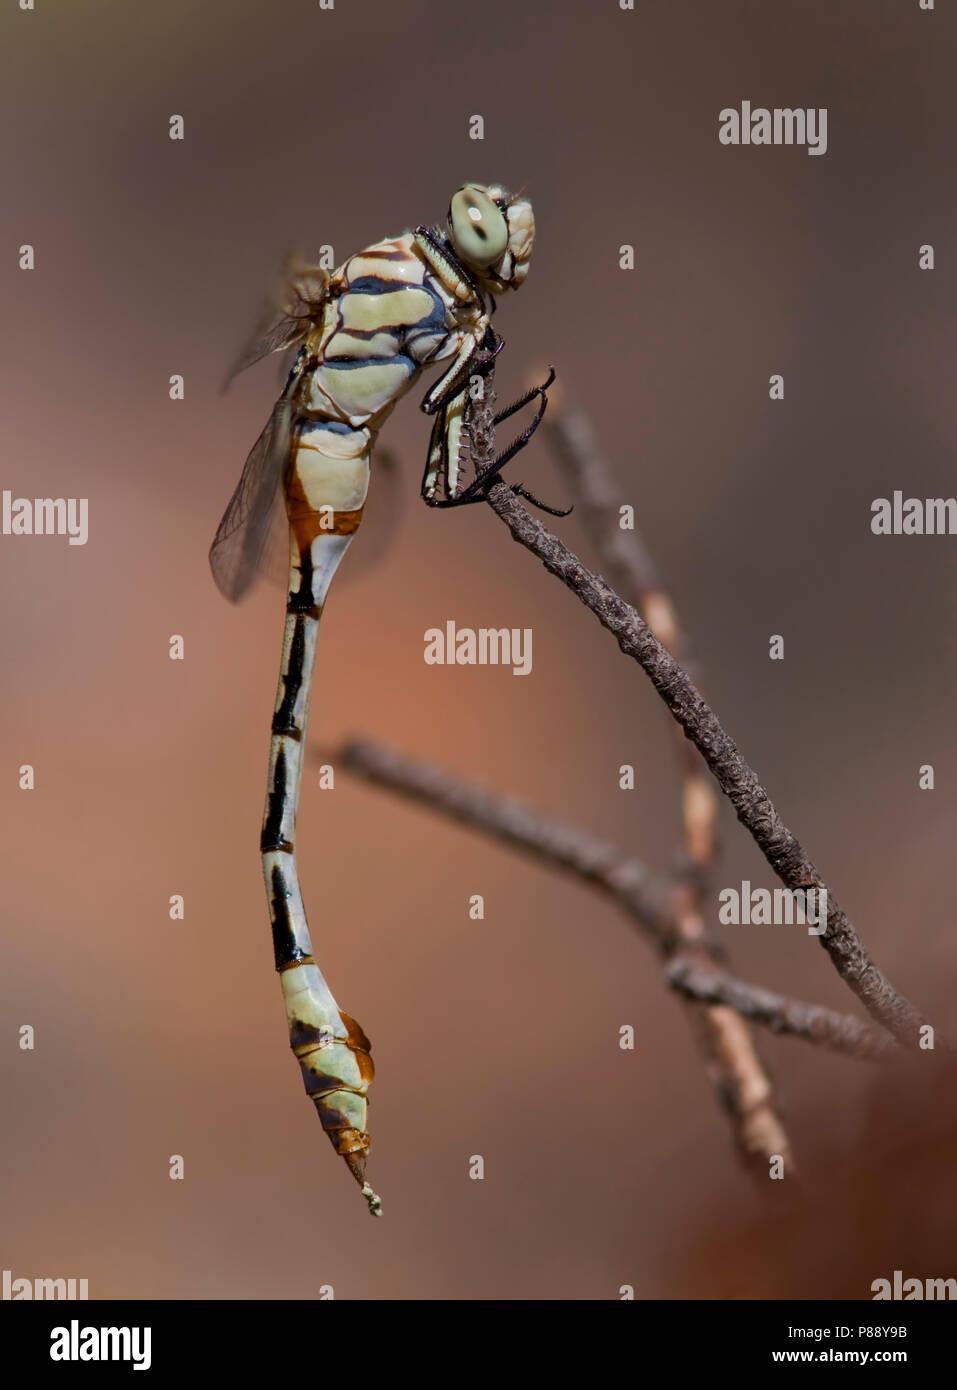 Imago Vaandeldrager Bladetail adultes; Photo Stock